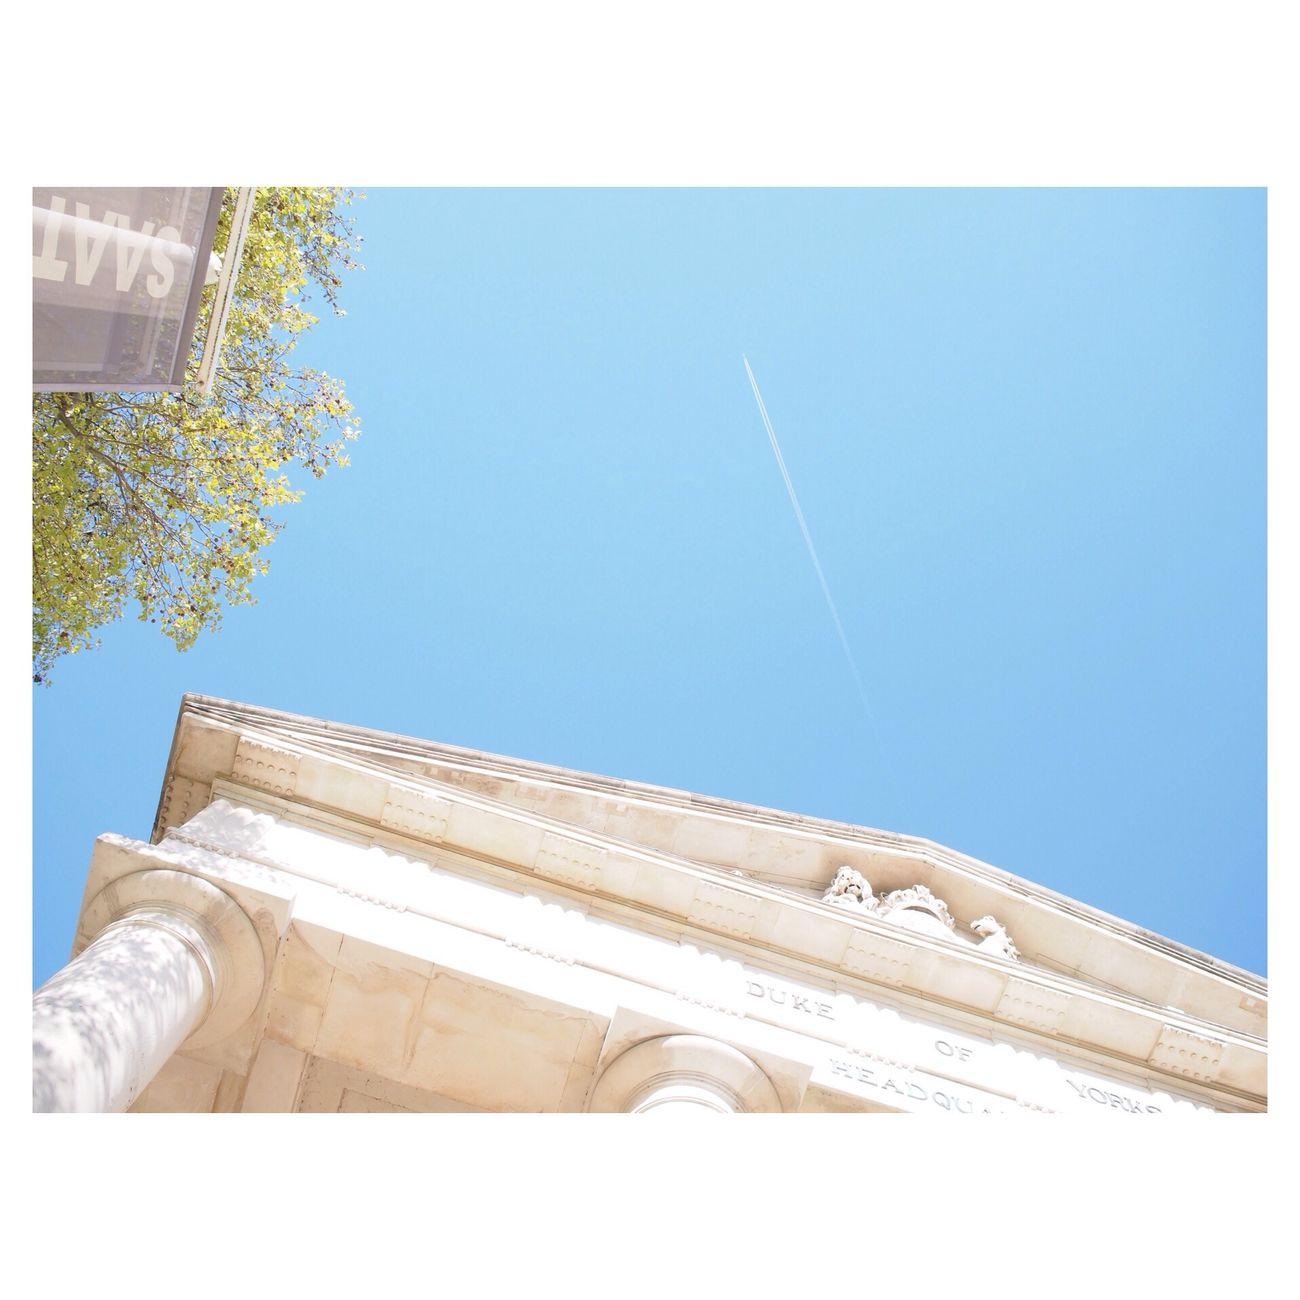 contrail Landscape London Saatchi Gallery Blue Sky